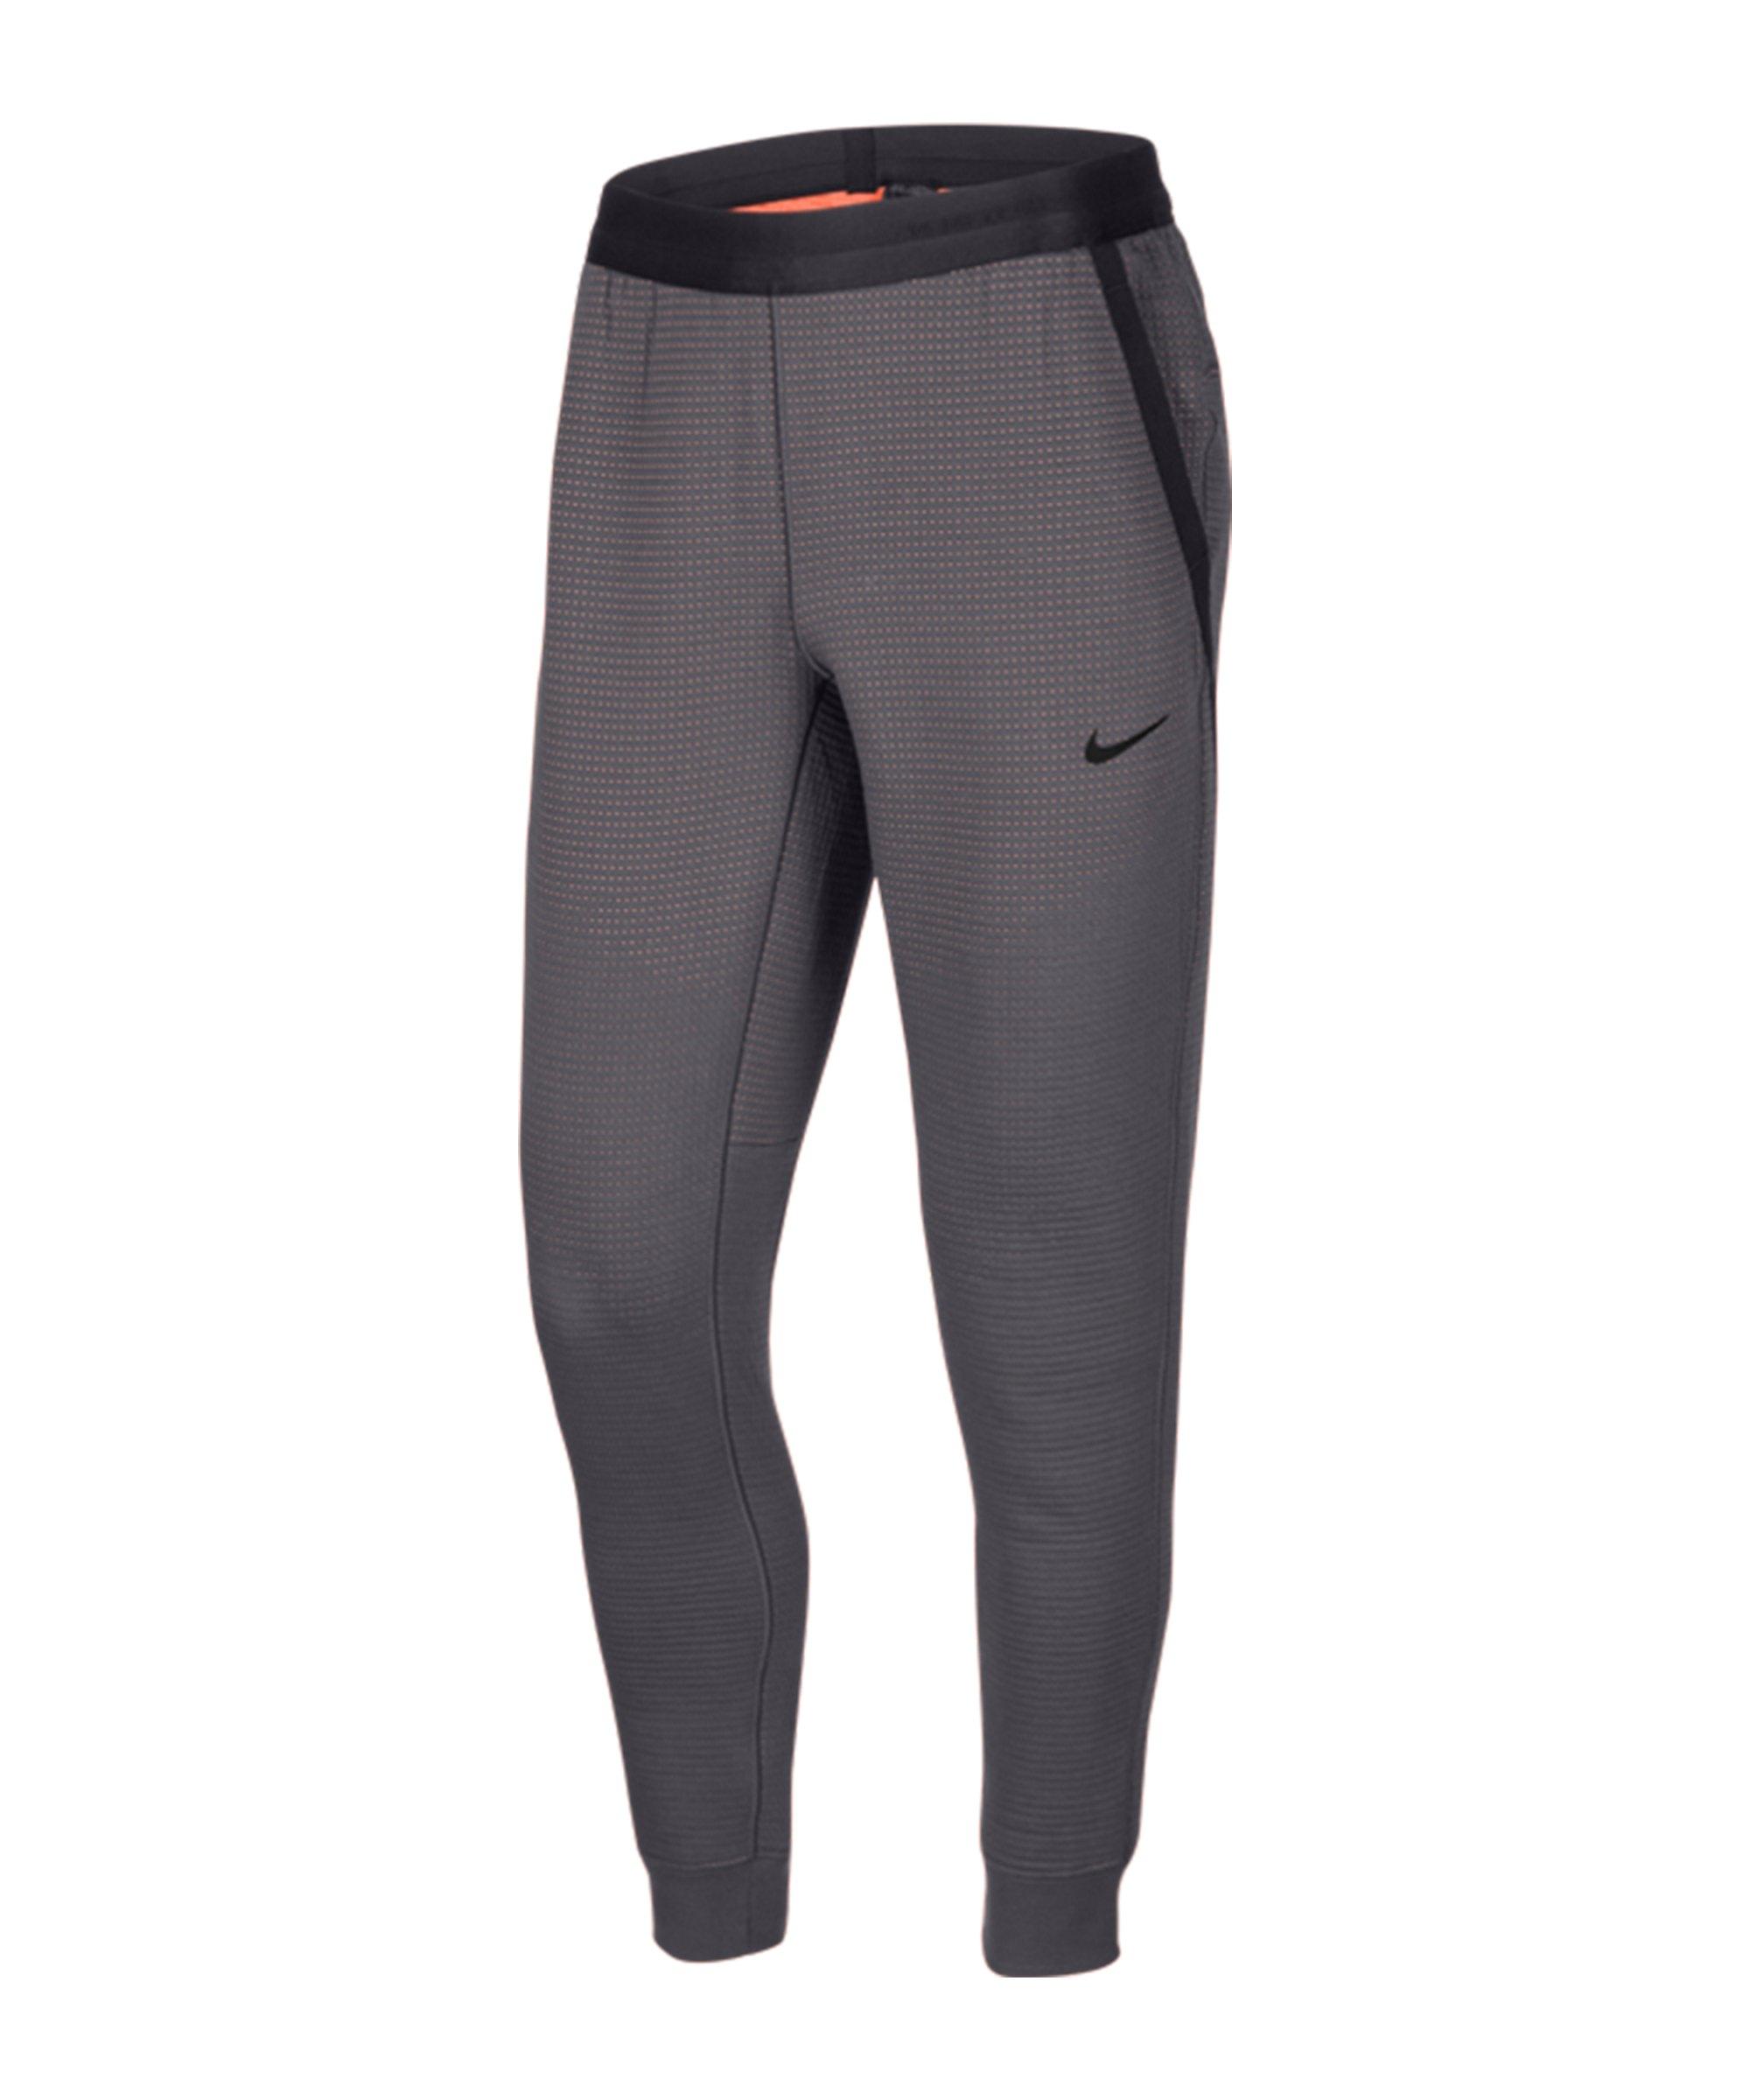 Nike Tech Pack Jogginghose Grau Orange F021 - grau